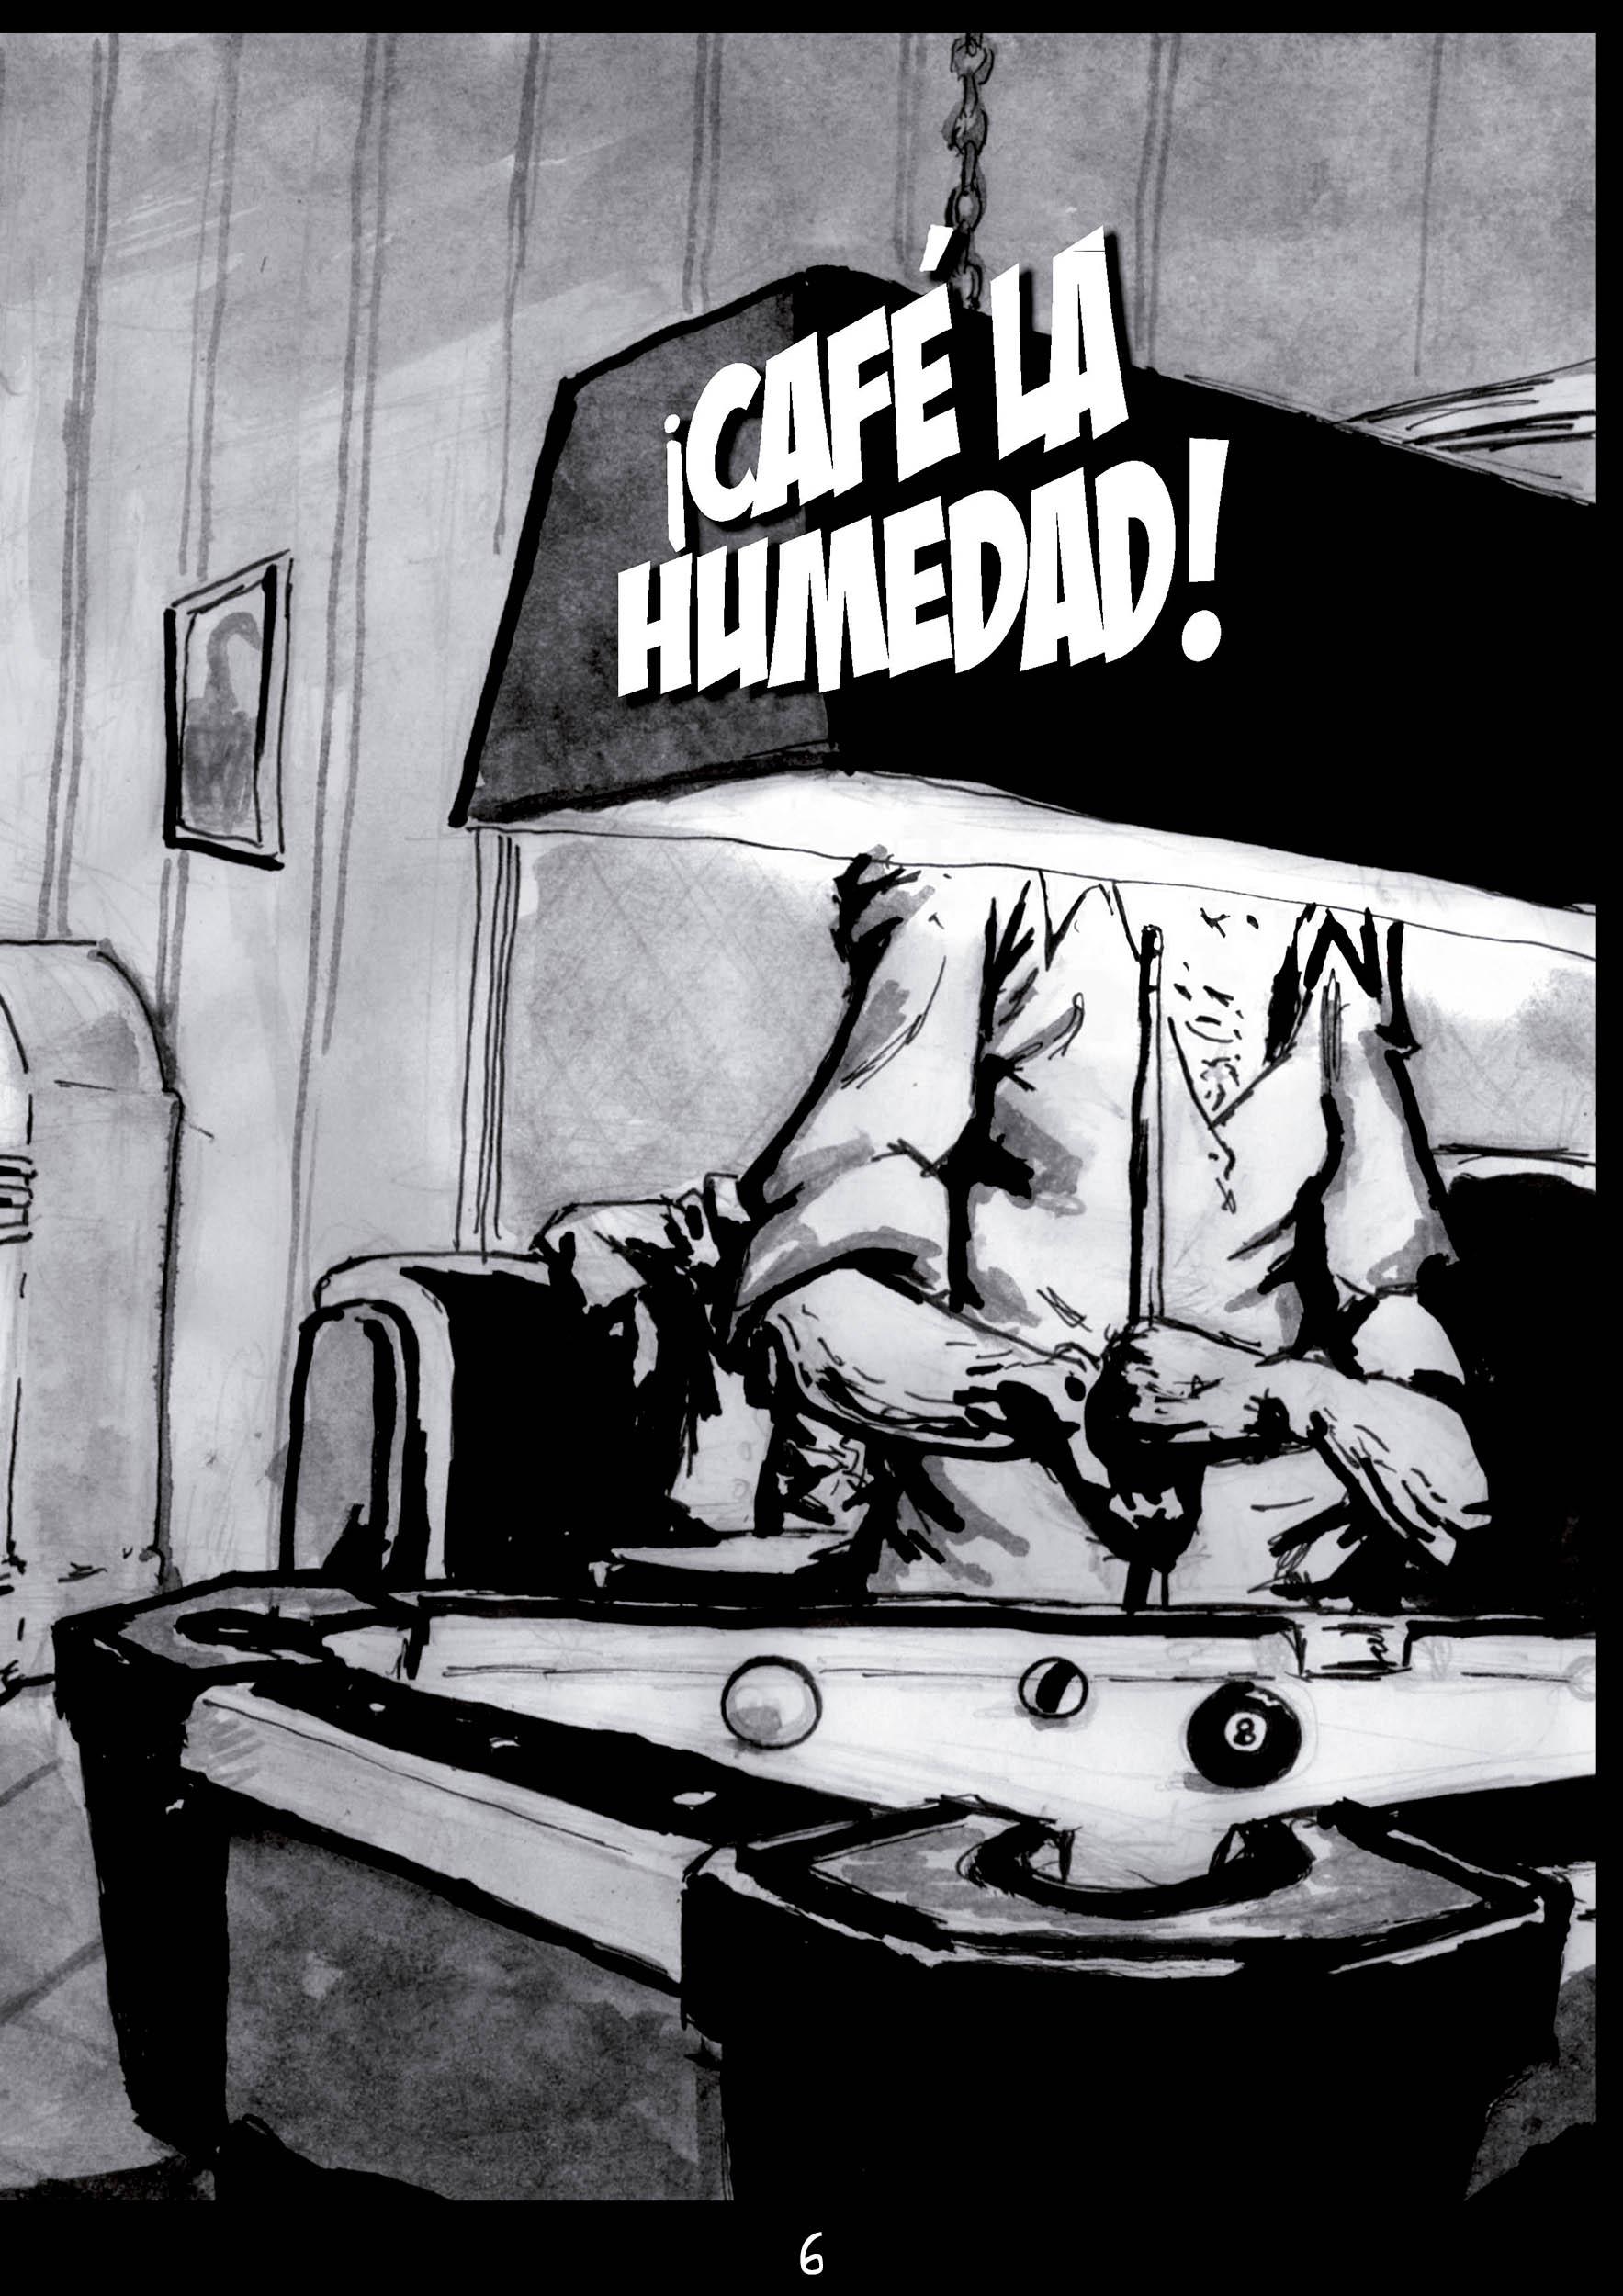 Café_la_Humedad_Julian_M_Camezzana_pagina00006